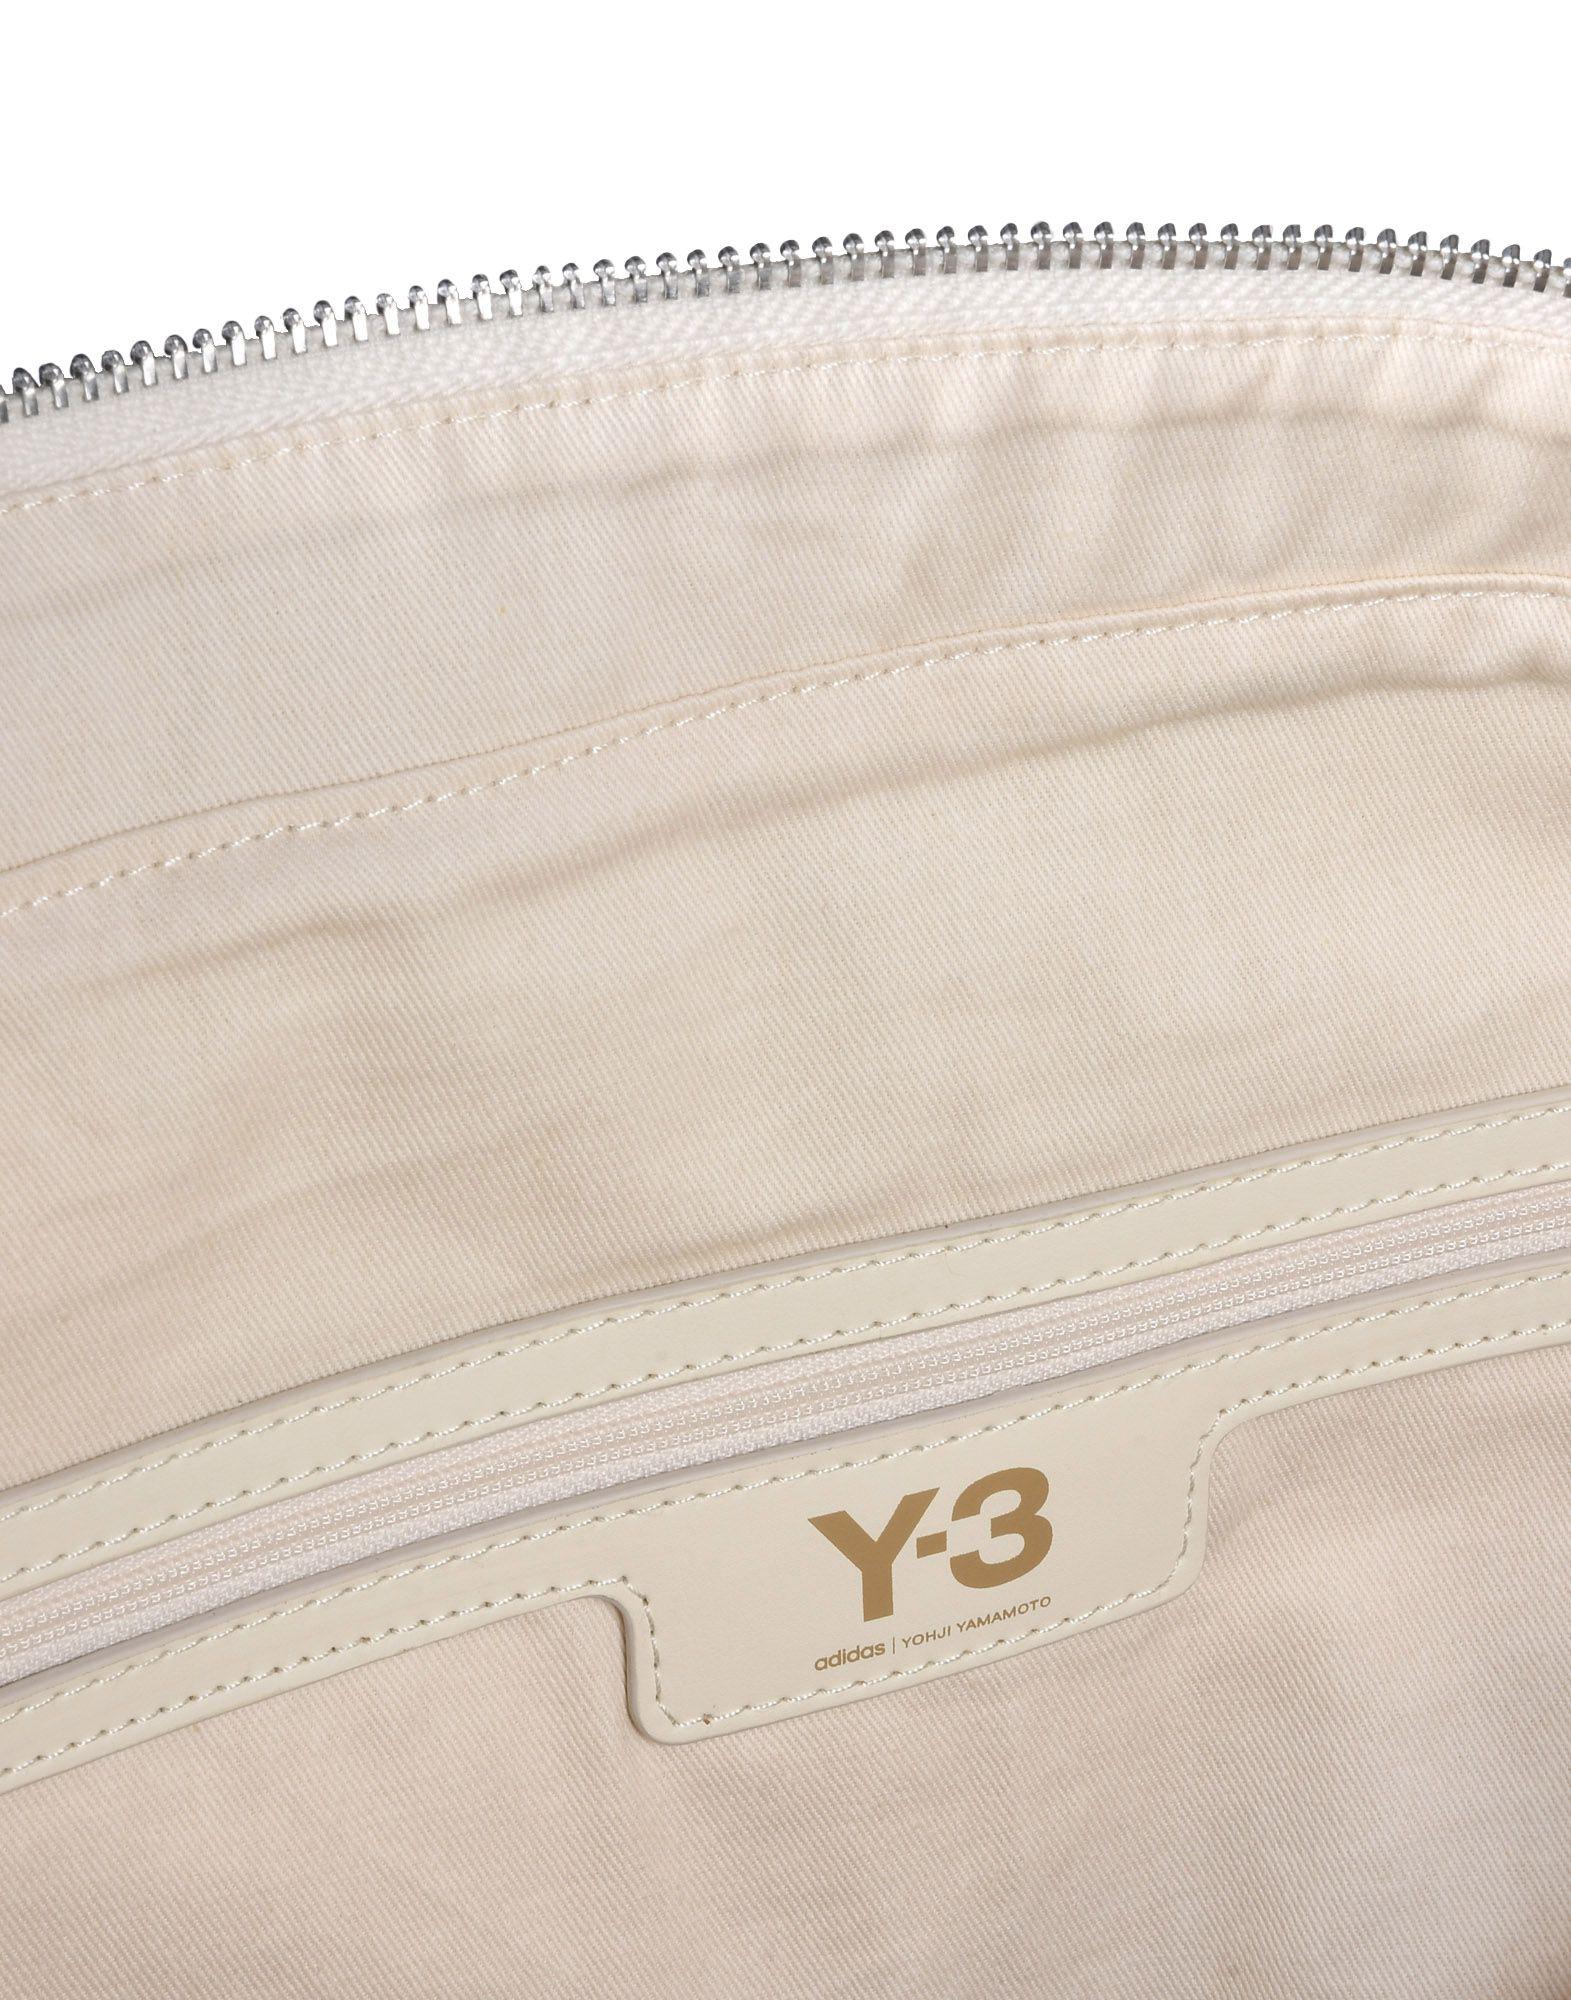 Y-3 Y-3 TOTE BAG Средняя сумка из текстиля E a